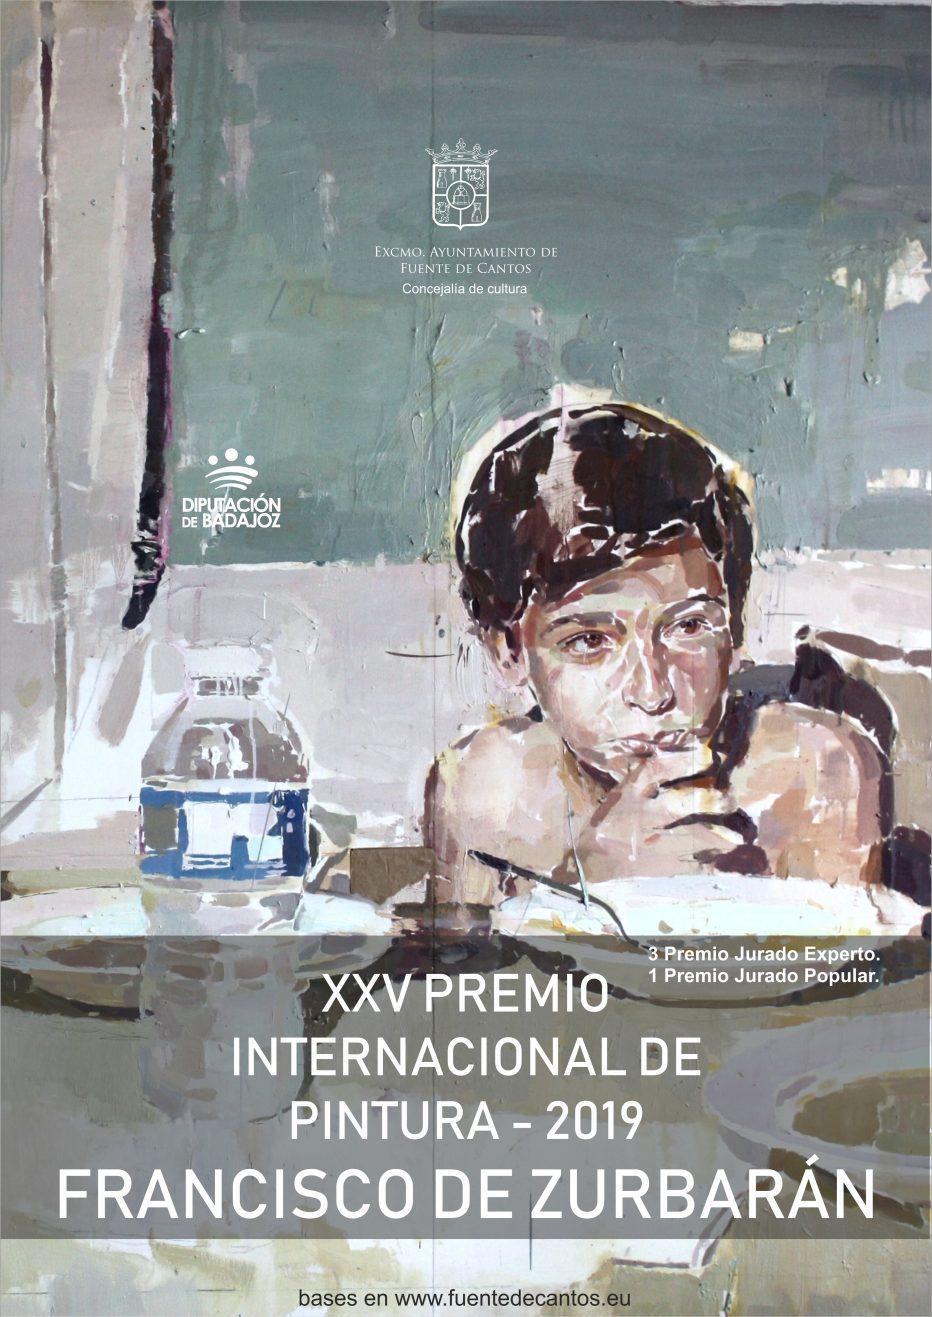 XXV PREMIO INTERNACIONAL DE PINTURA – 2019 FRANCISCO DE ZURBARÁN